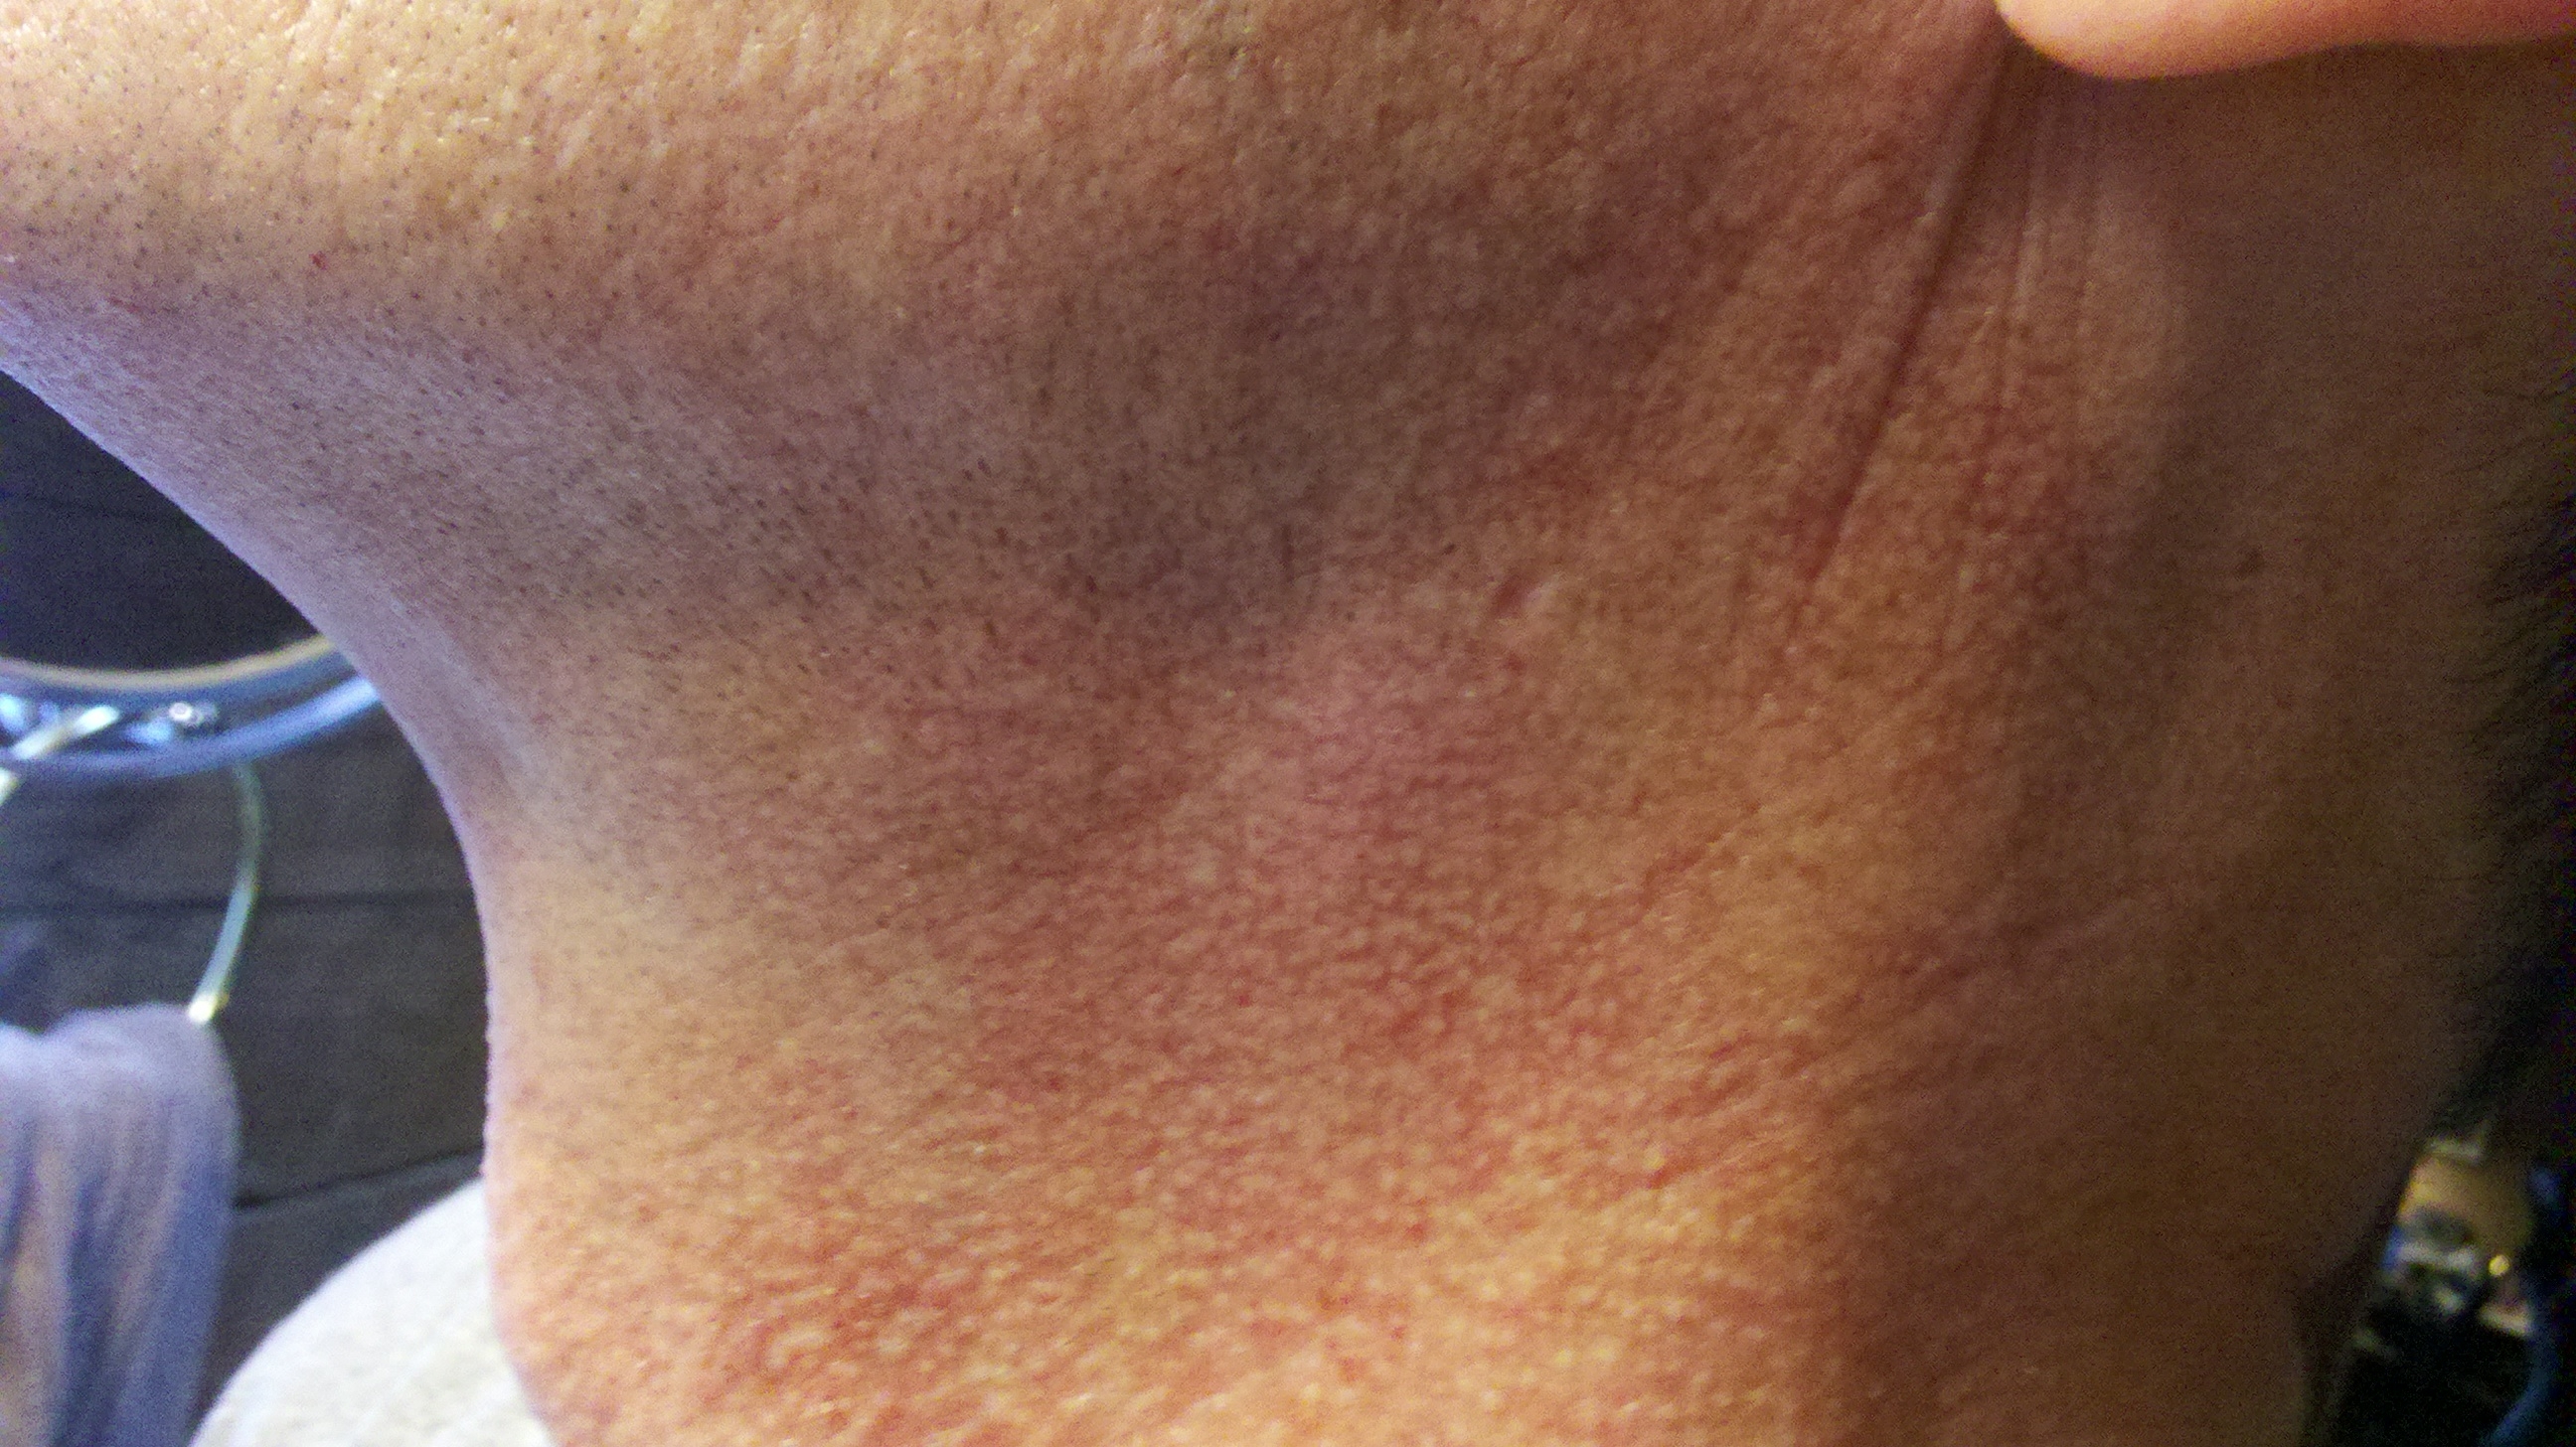 Diagnosing A Skin Rash